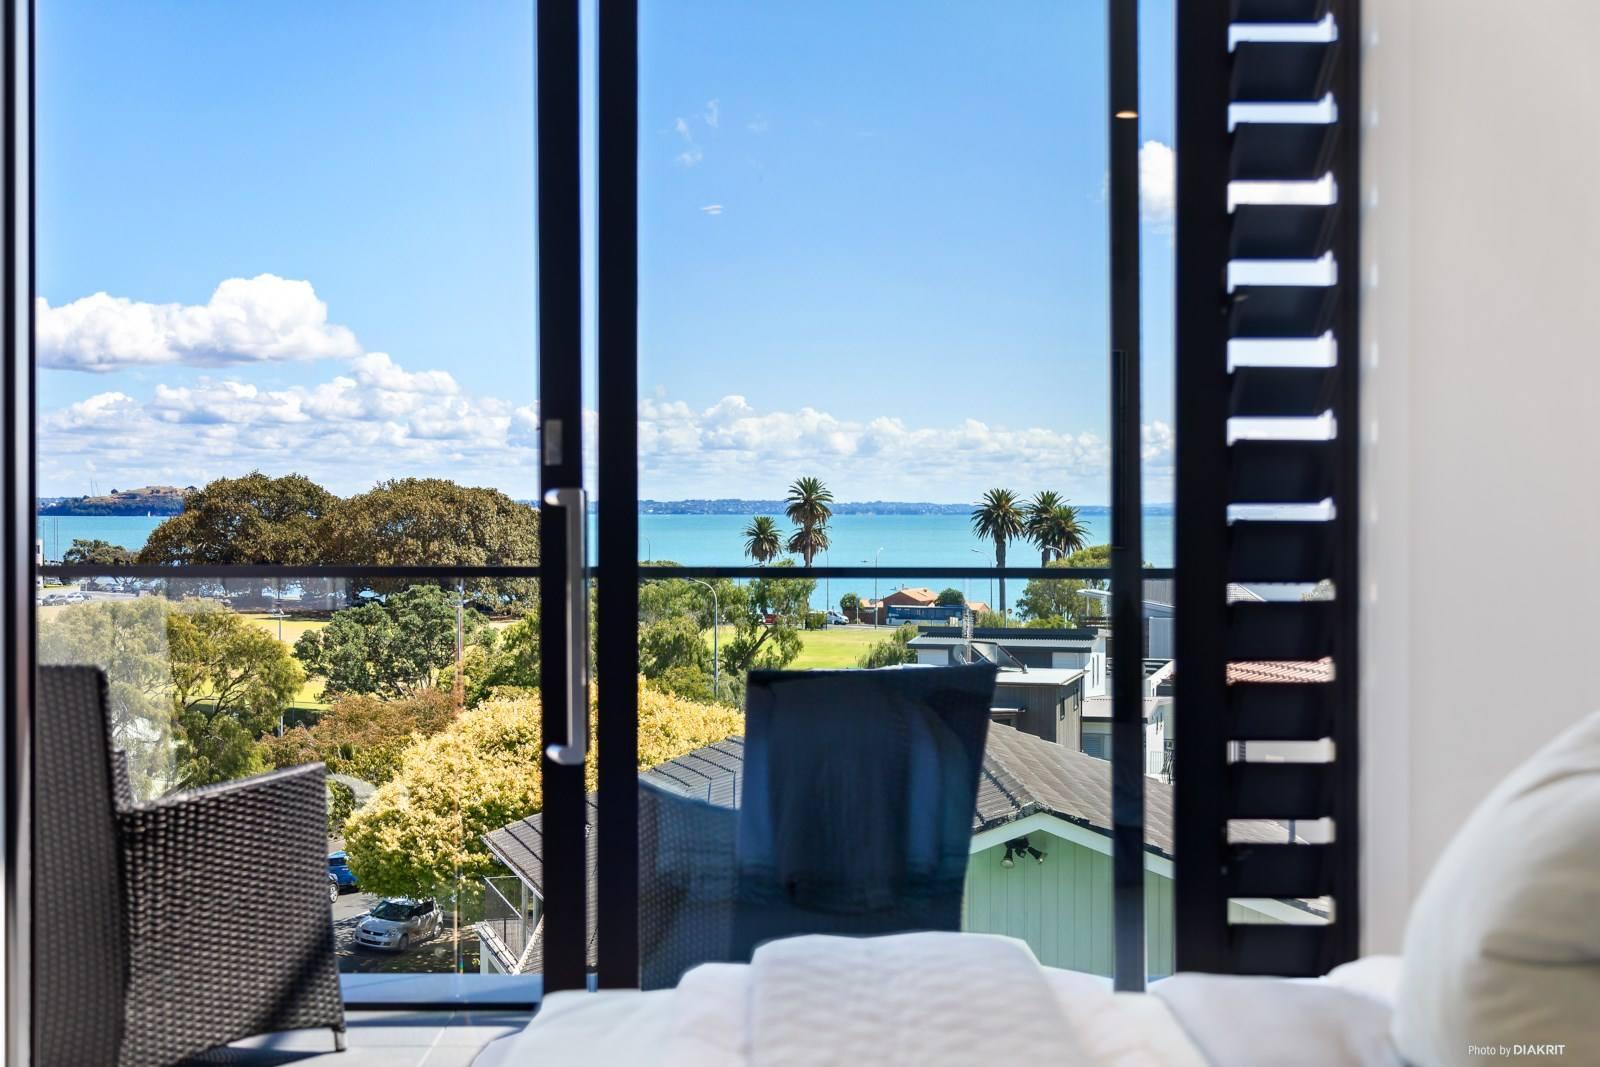 Saint Heliers 3房 全新奢华城市屋 享海港无垠风光 采光一流 步行至海滩/公园 舒适生活等你来 Perfect Village Lifestyle & Sea Views